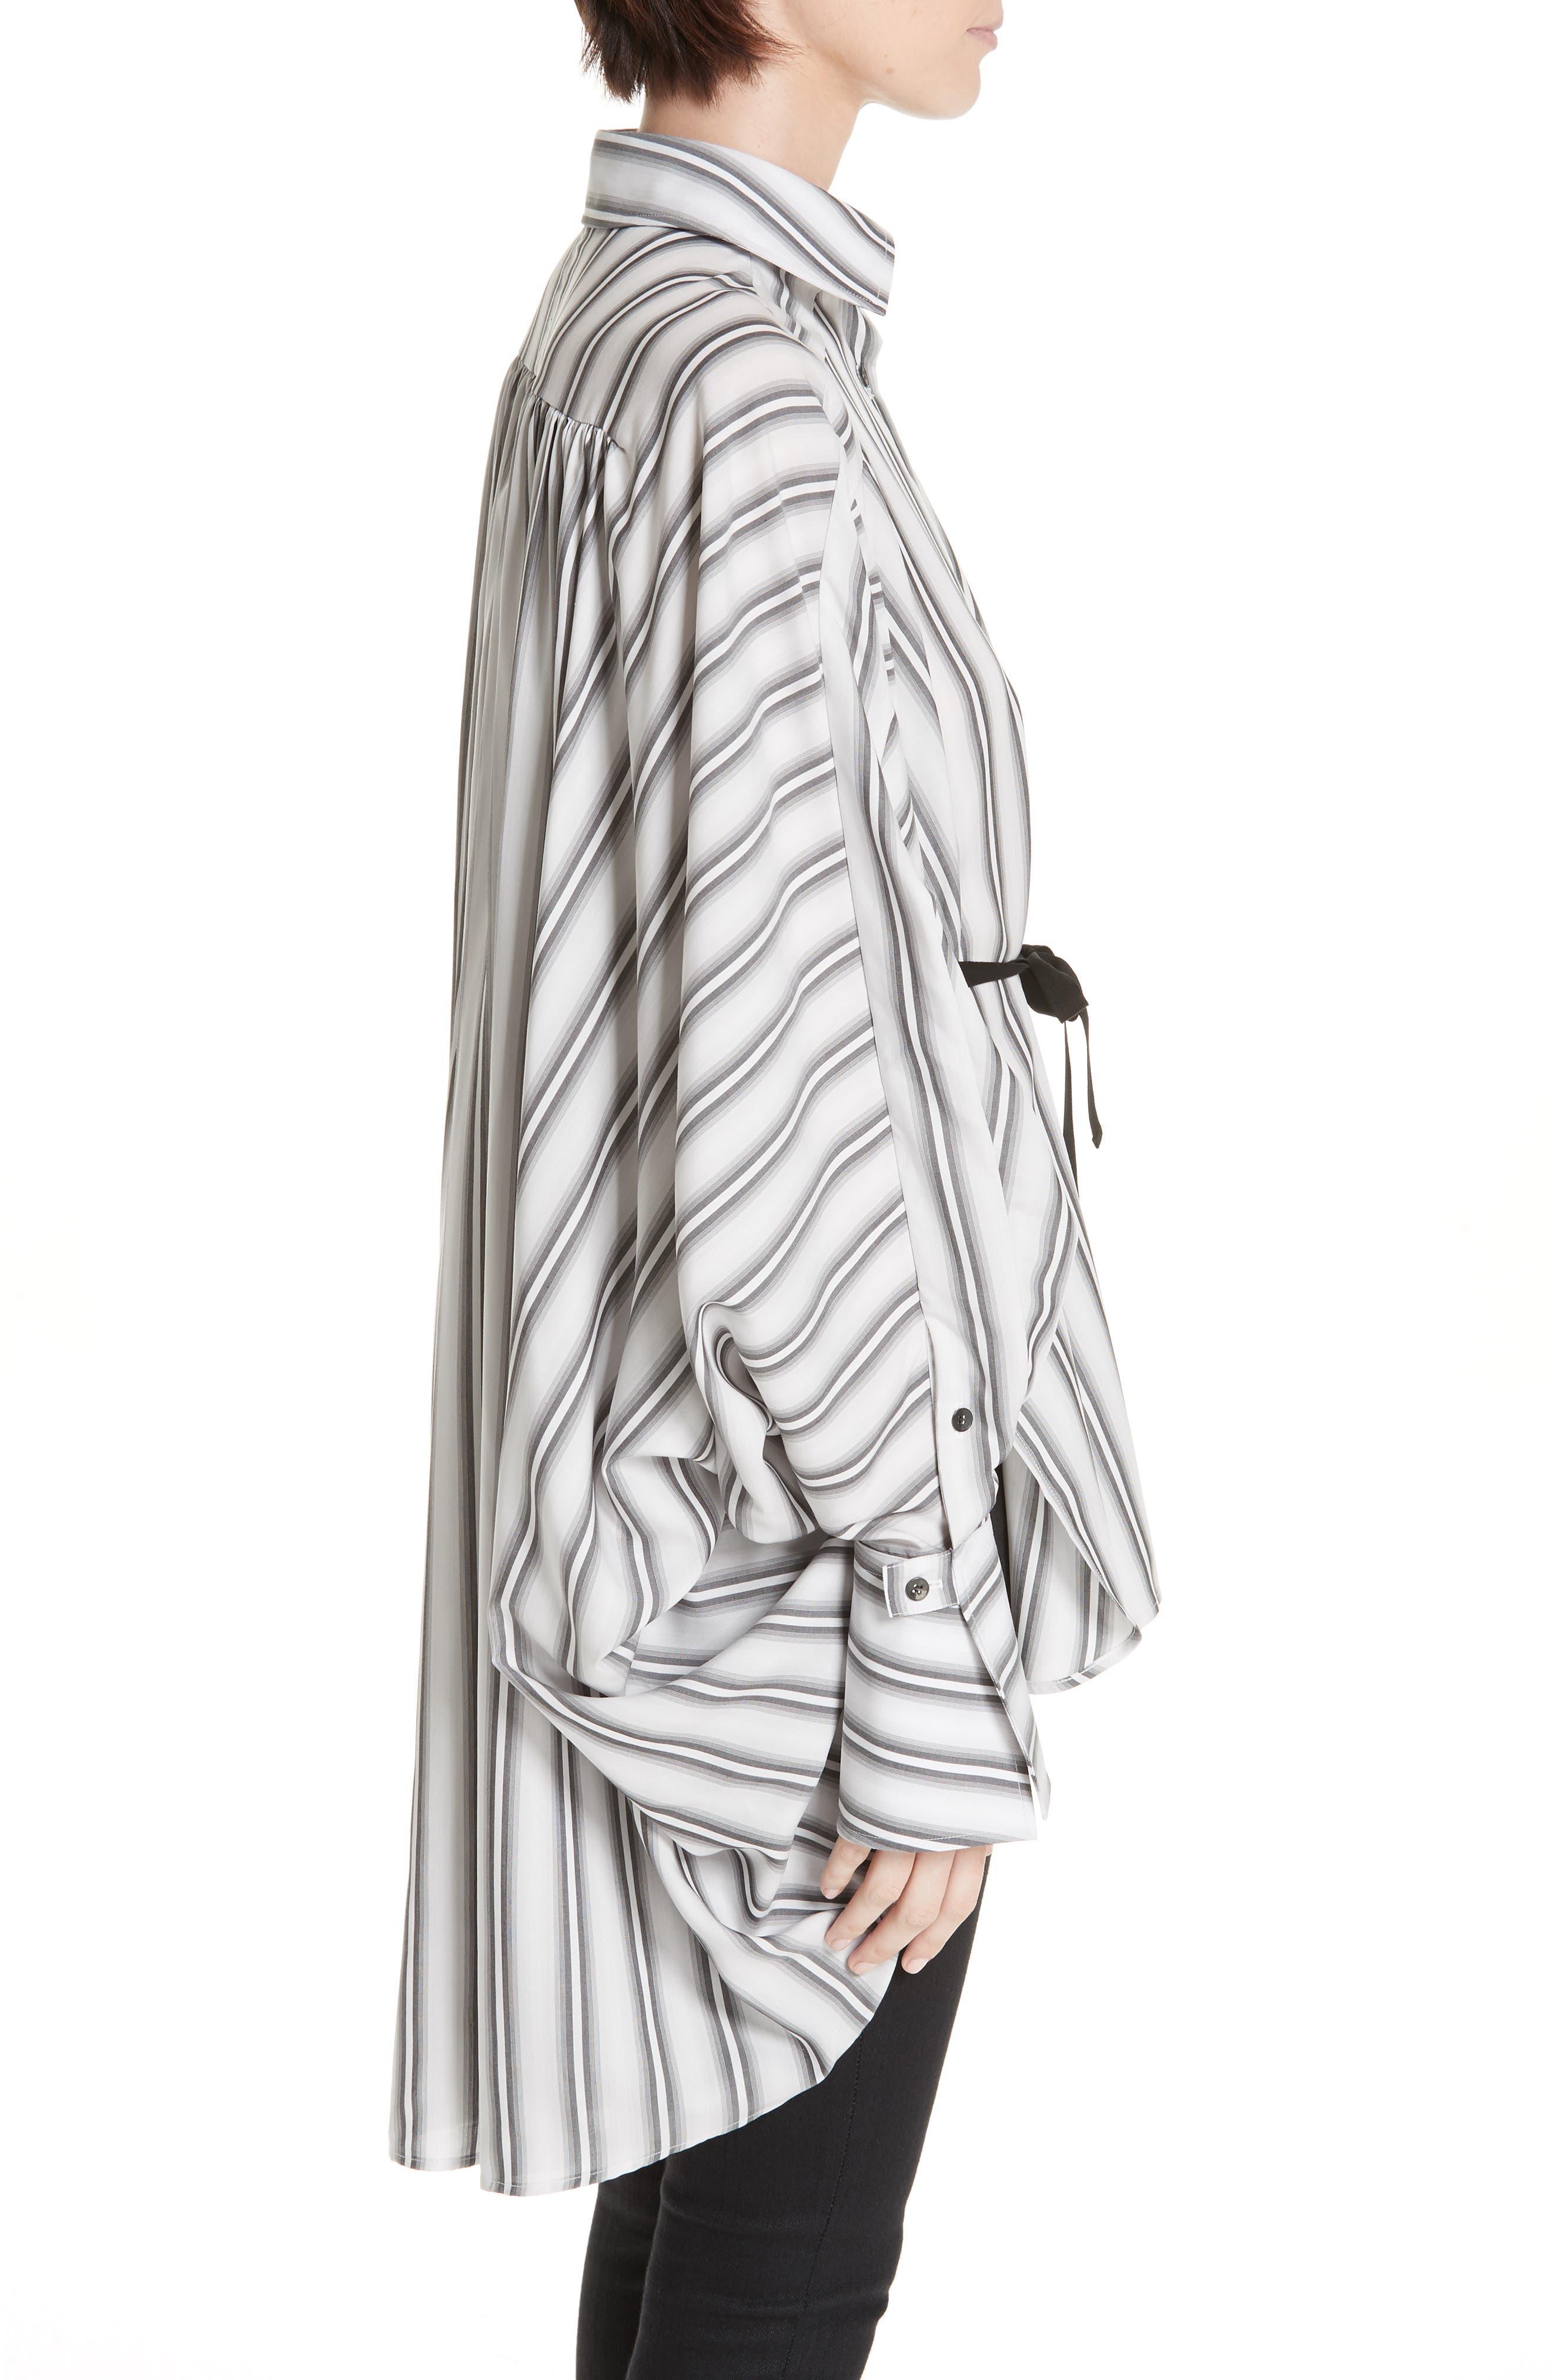 PALMER/HARDING, Streep Stripe Shirt, Alternate thumbnail 3, color, GRADIENT STRIPE WITH BLACK